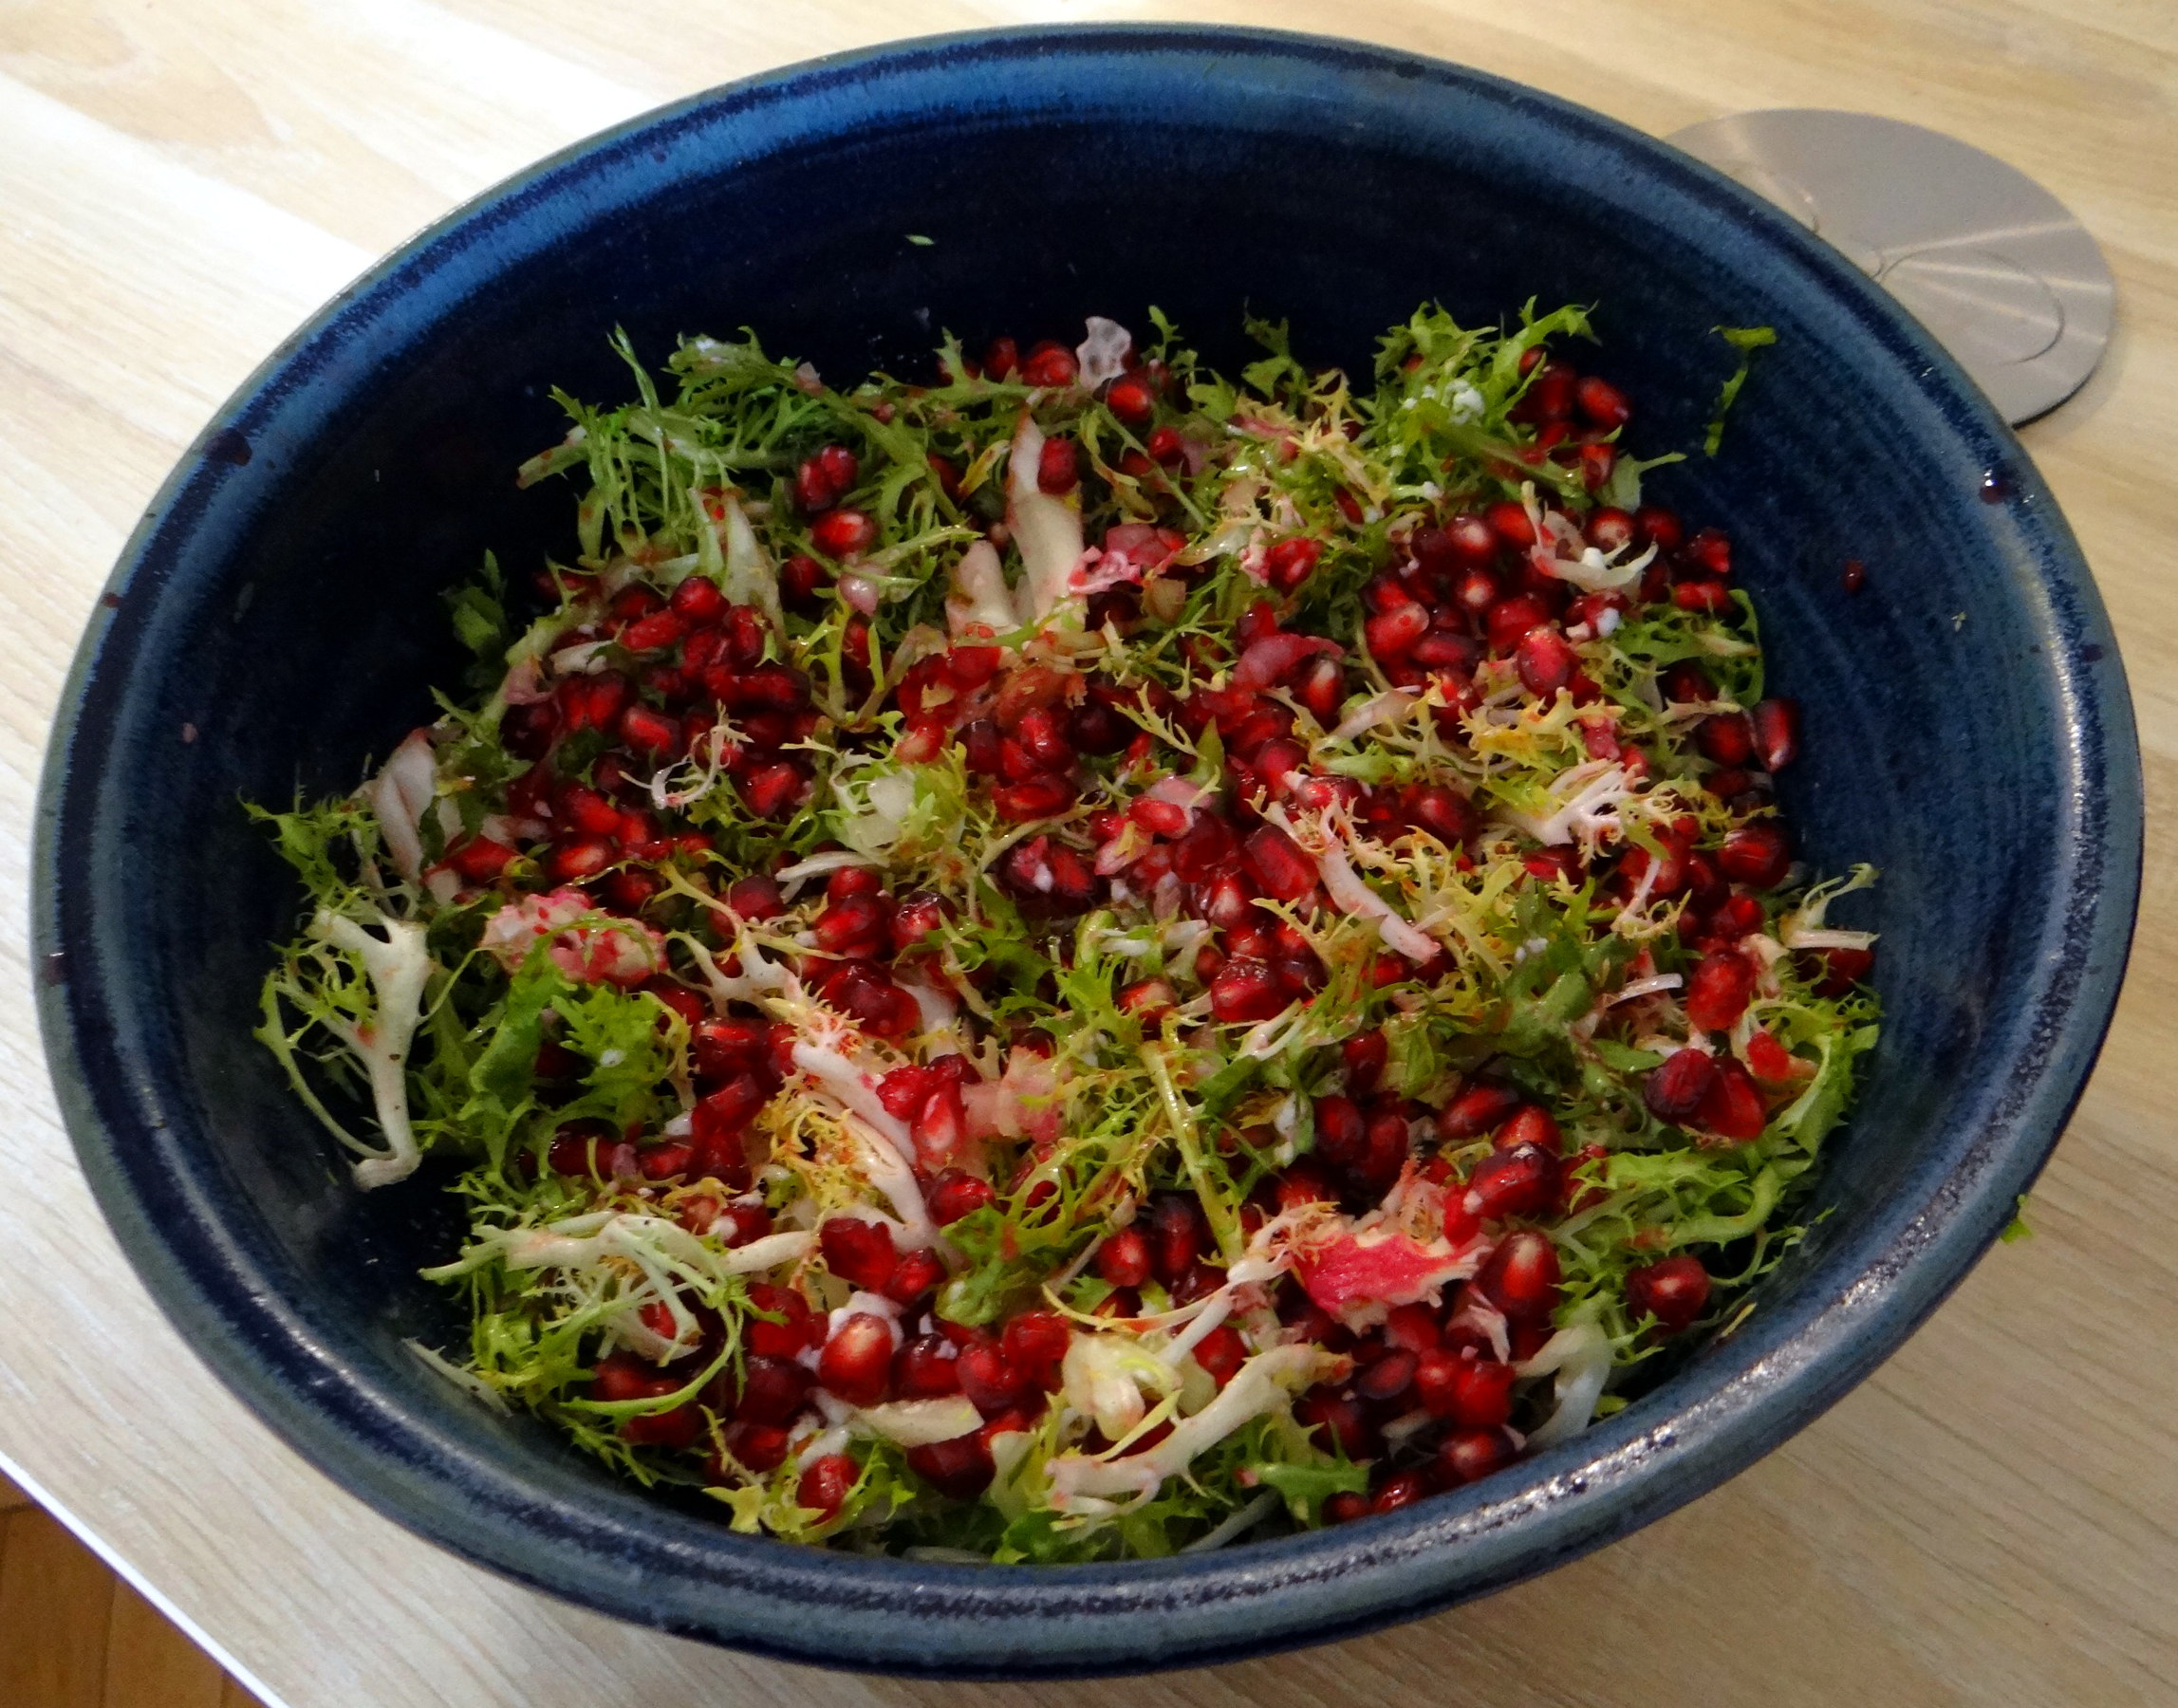 Seidentofu,Frisee Salat,Kartoffel Mix (12)